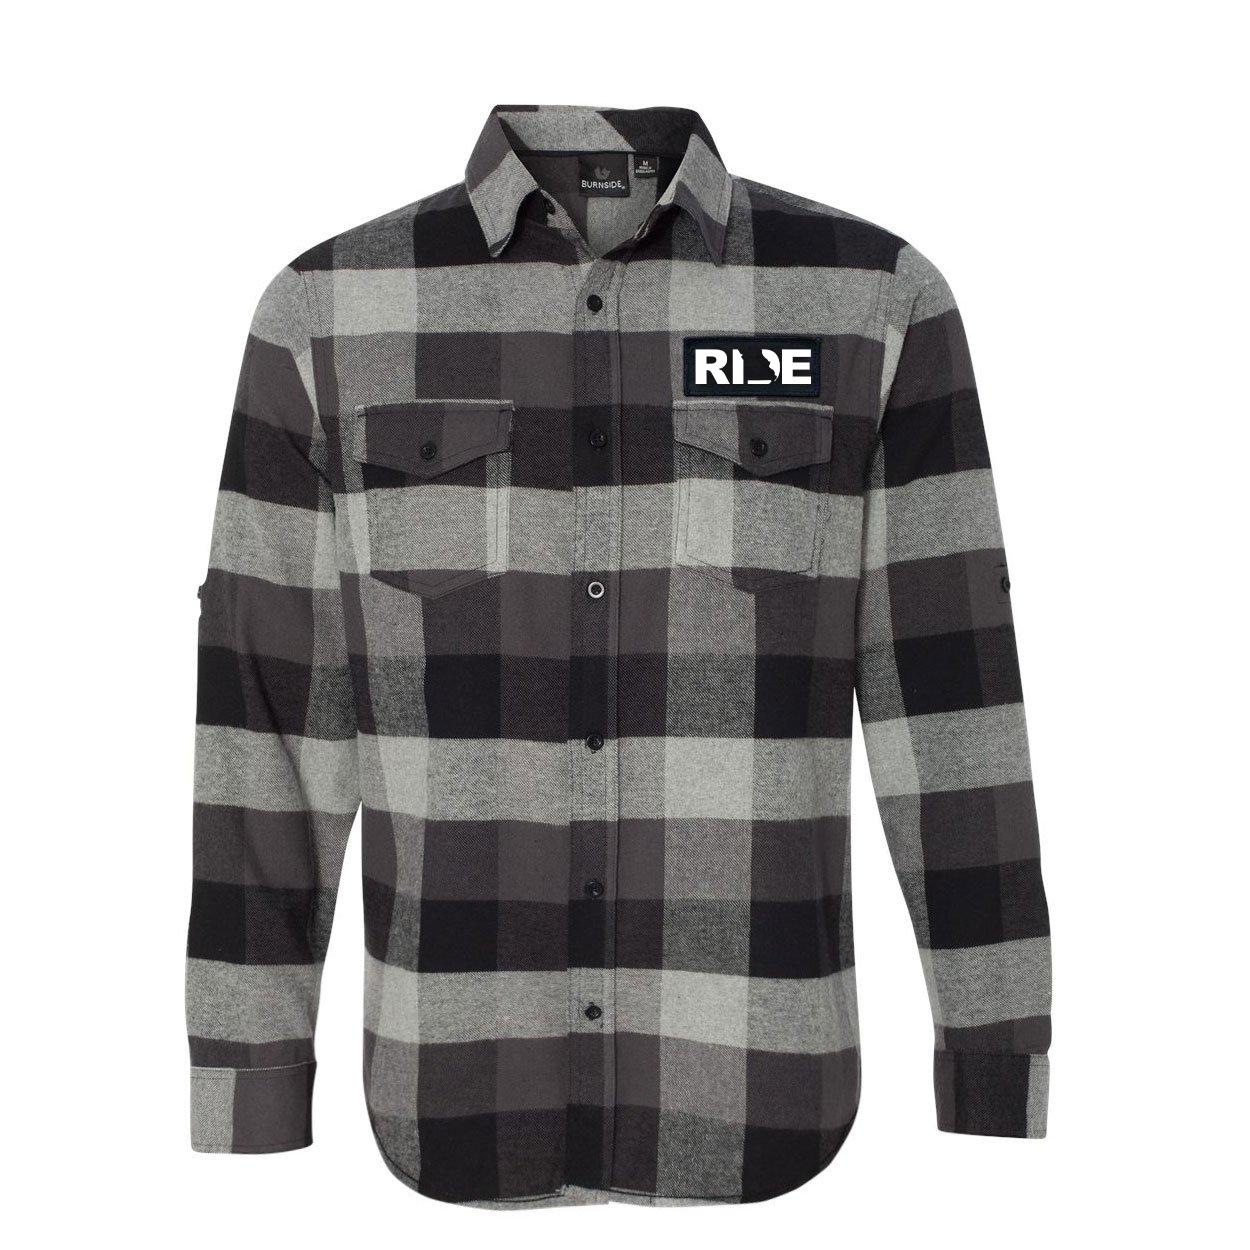 Ride Missouri Classic Unisex Long Sleeve Woven Patch Flannel Shirt Black/Gray (White Logo)